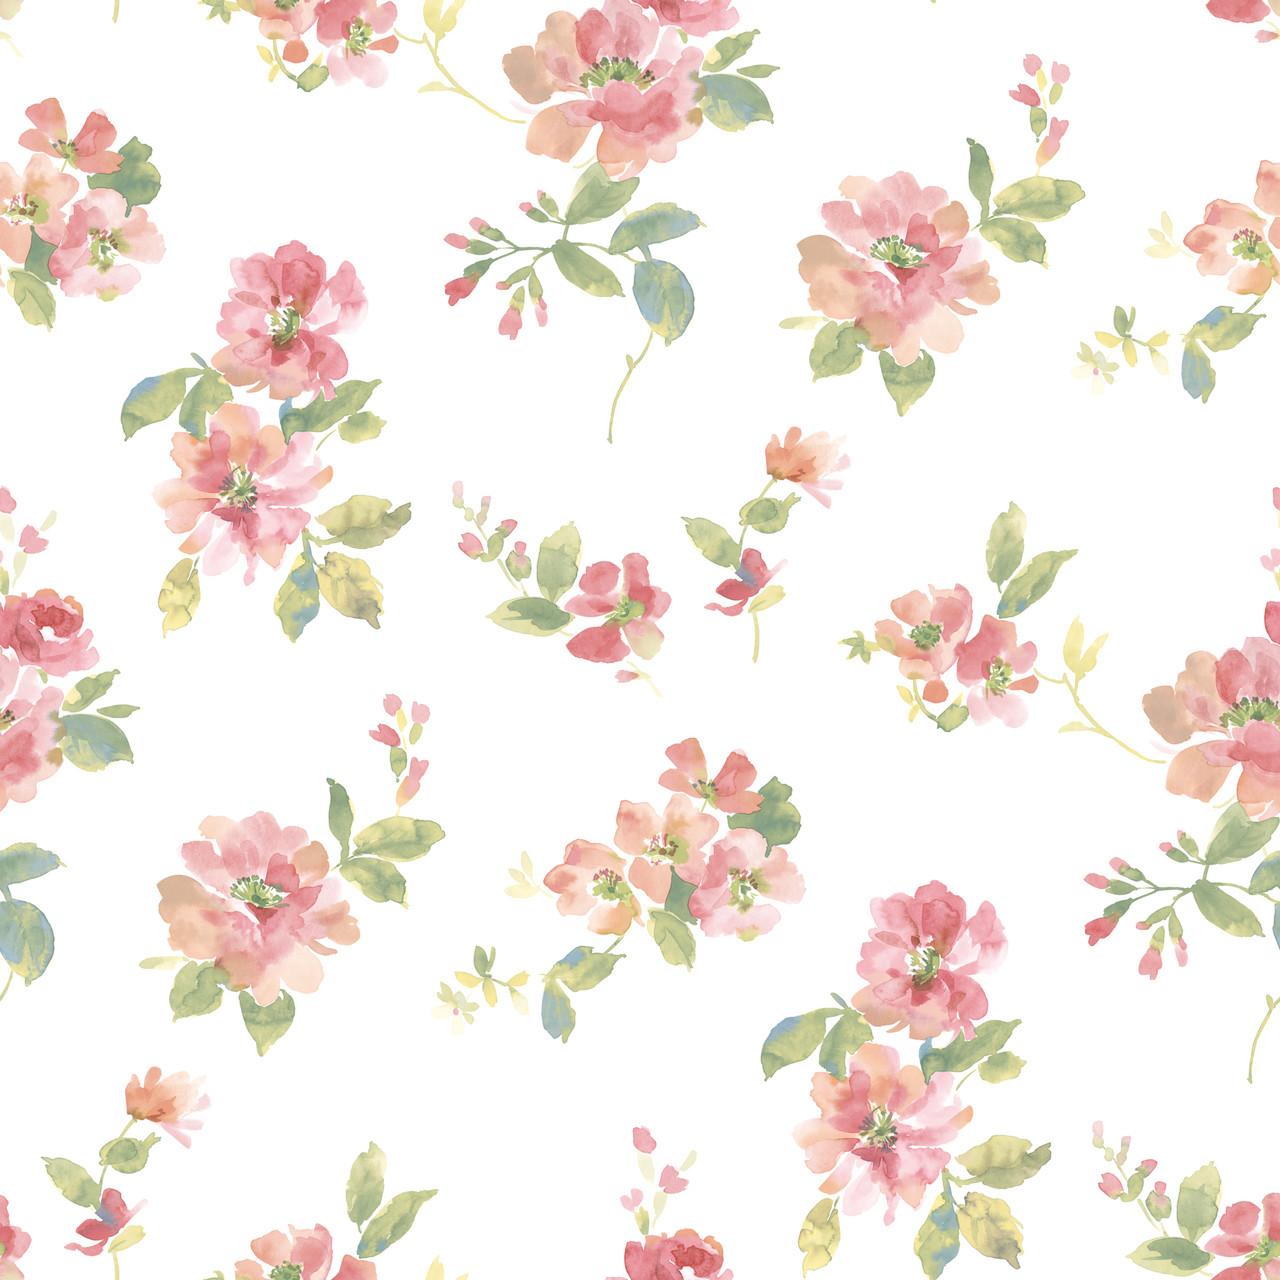 Captiva Peach Watercolor Floral Dlr54592 Wallpaper